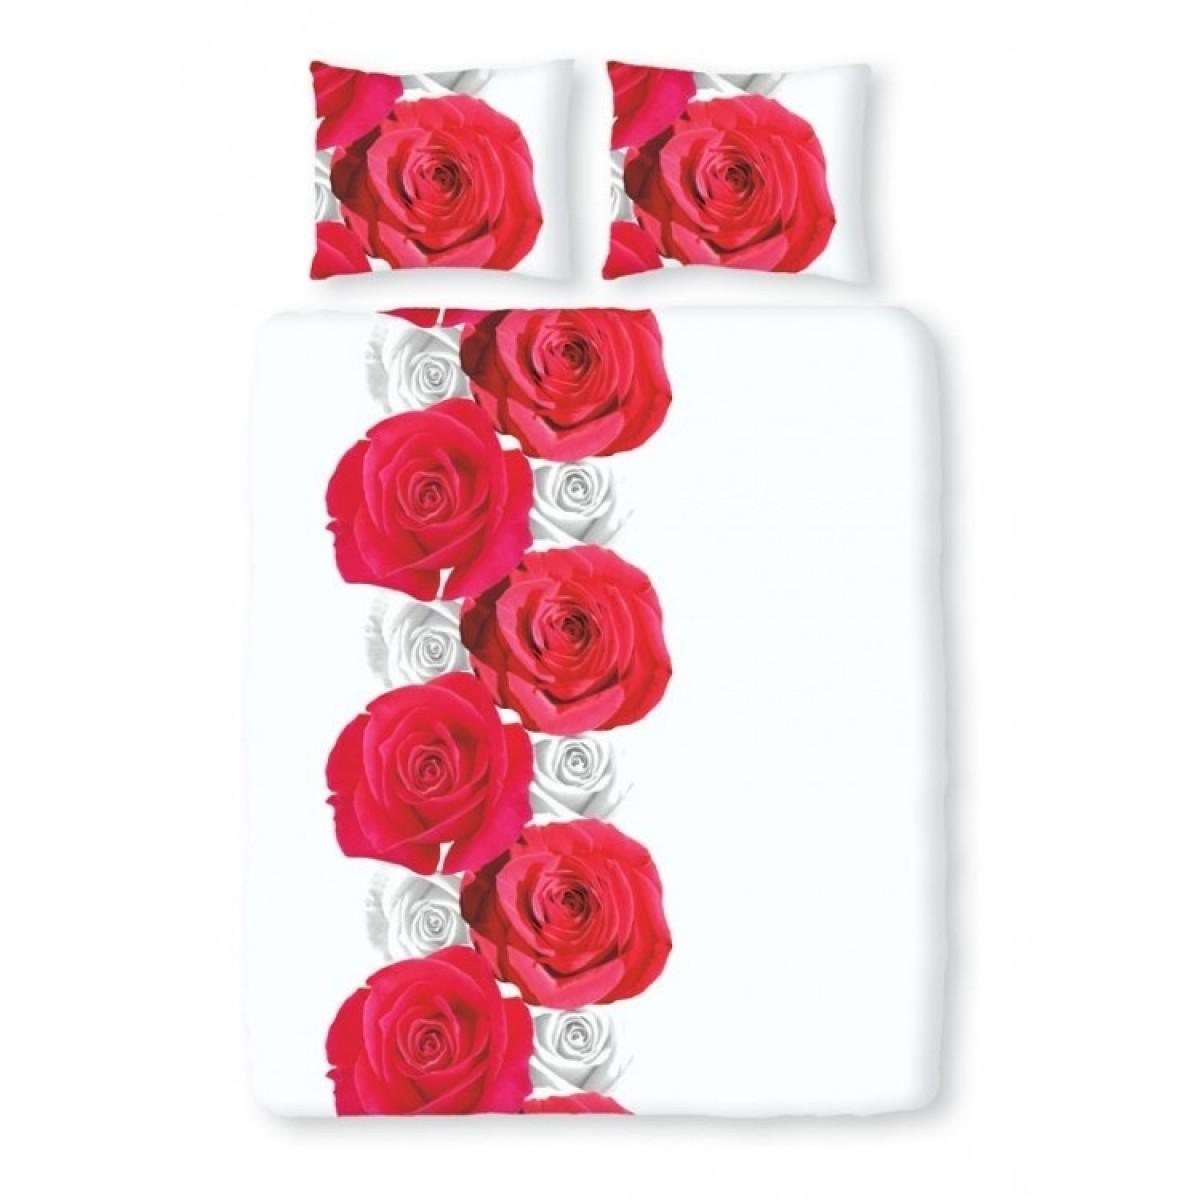 Romanette Satin D'or Roses Wit